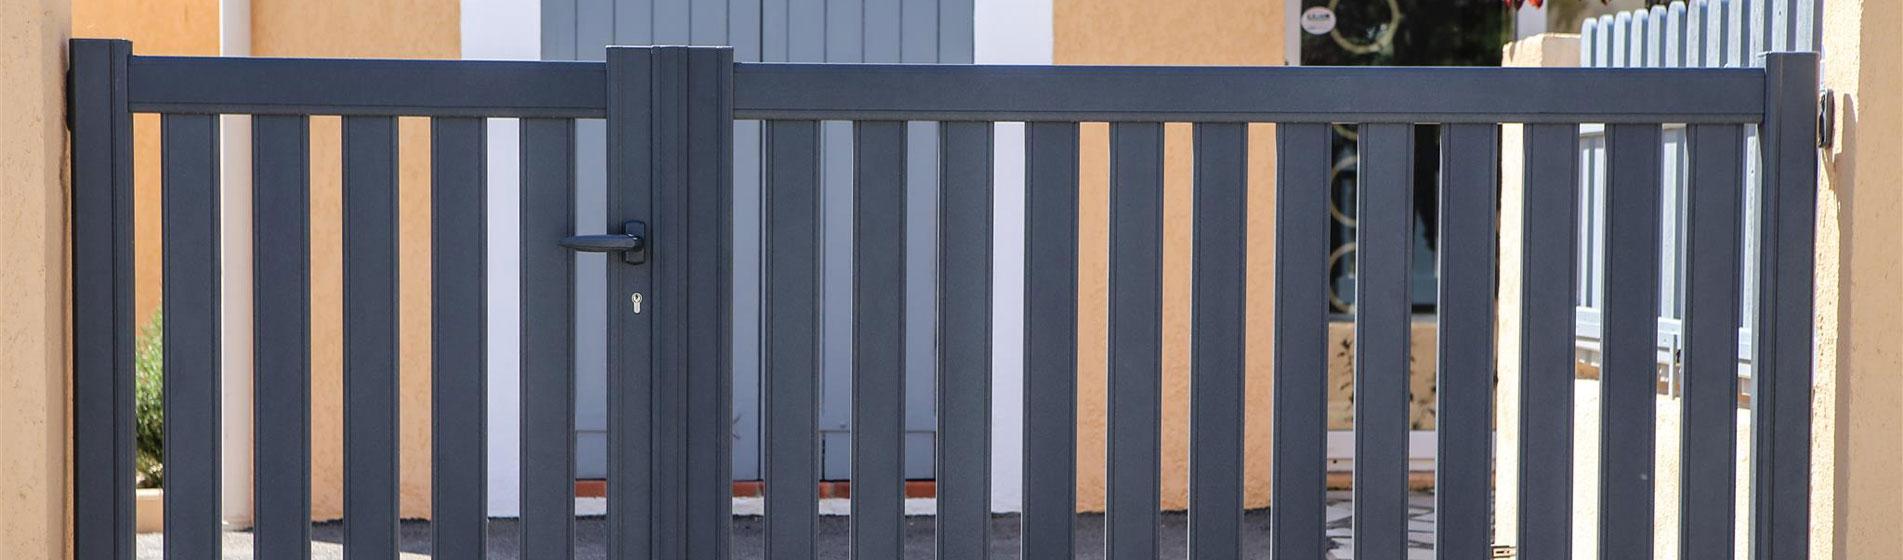 pose portail battant aluminium motoris devis gratuit. Black Bedroom Furniture Sets. Home Design Ideas